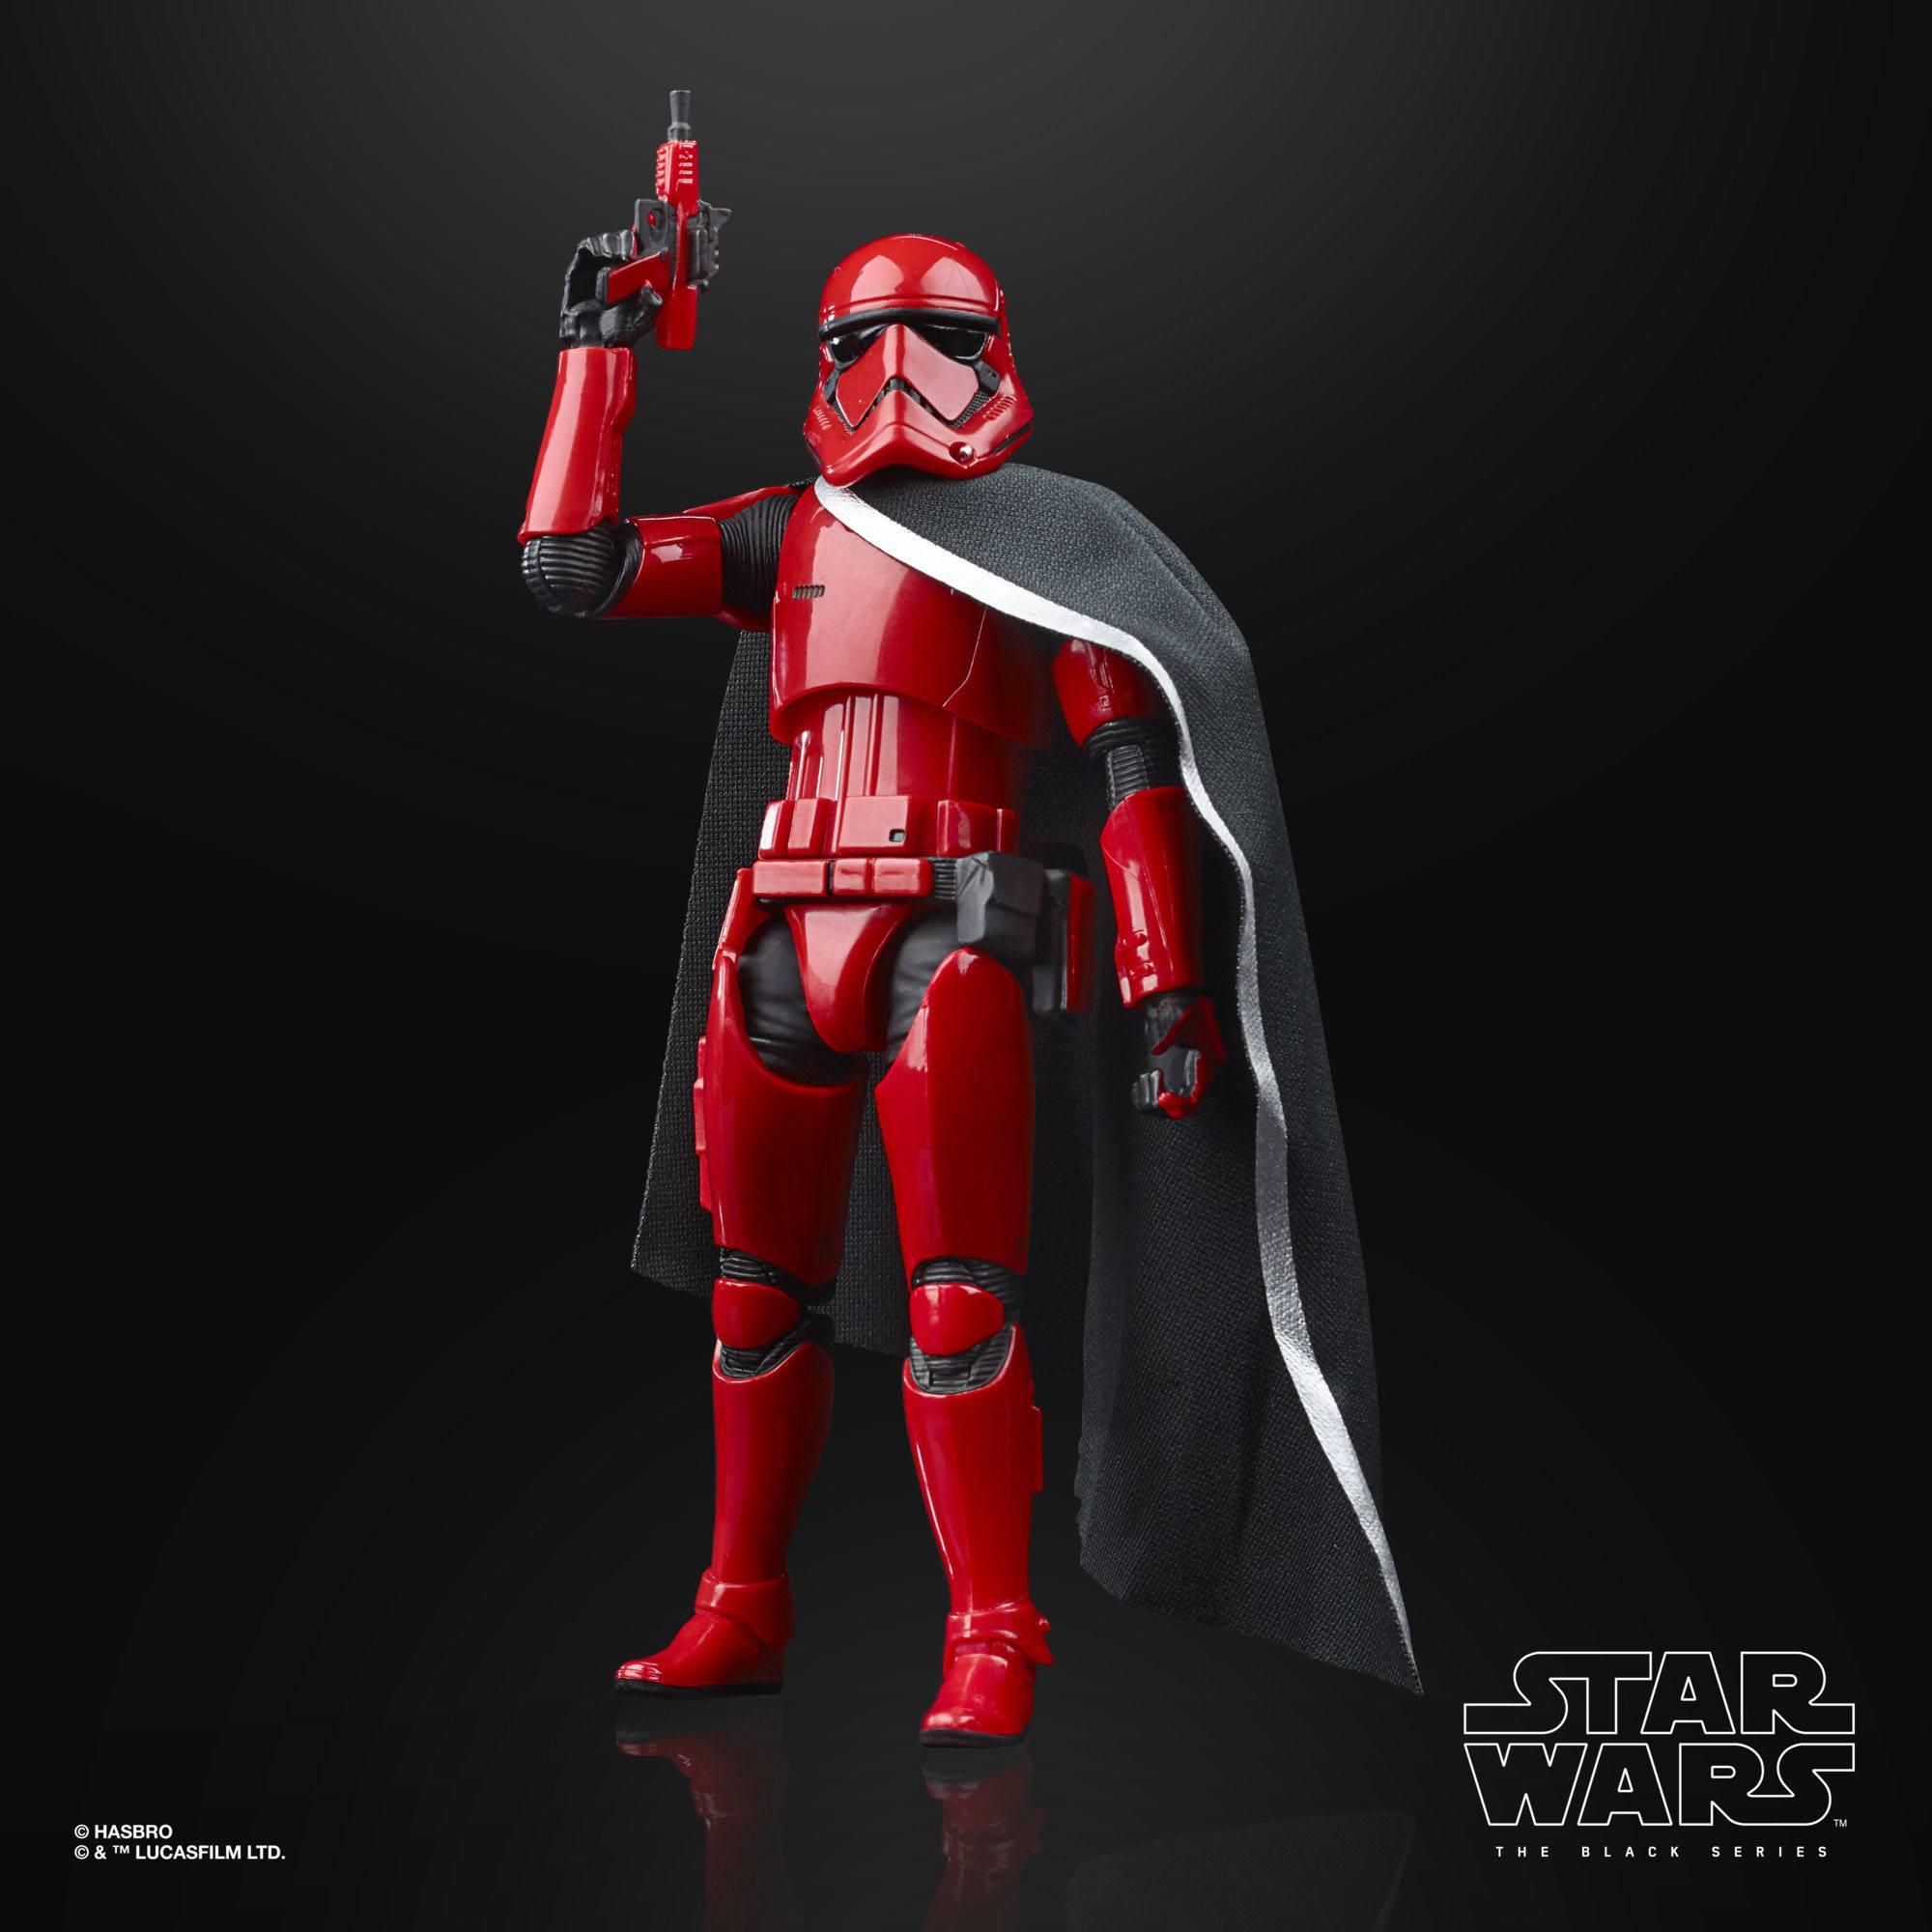 Star Wars Galaxy's Edge Black Series Captain Cardinal 15 cm HASE9700 5010993729937